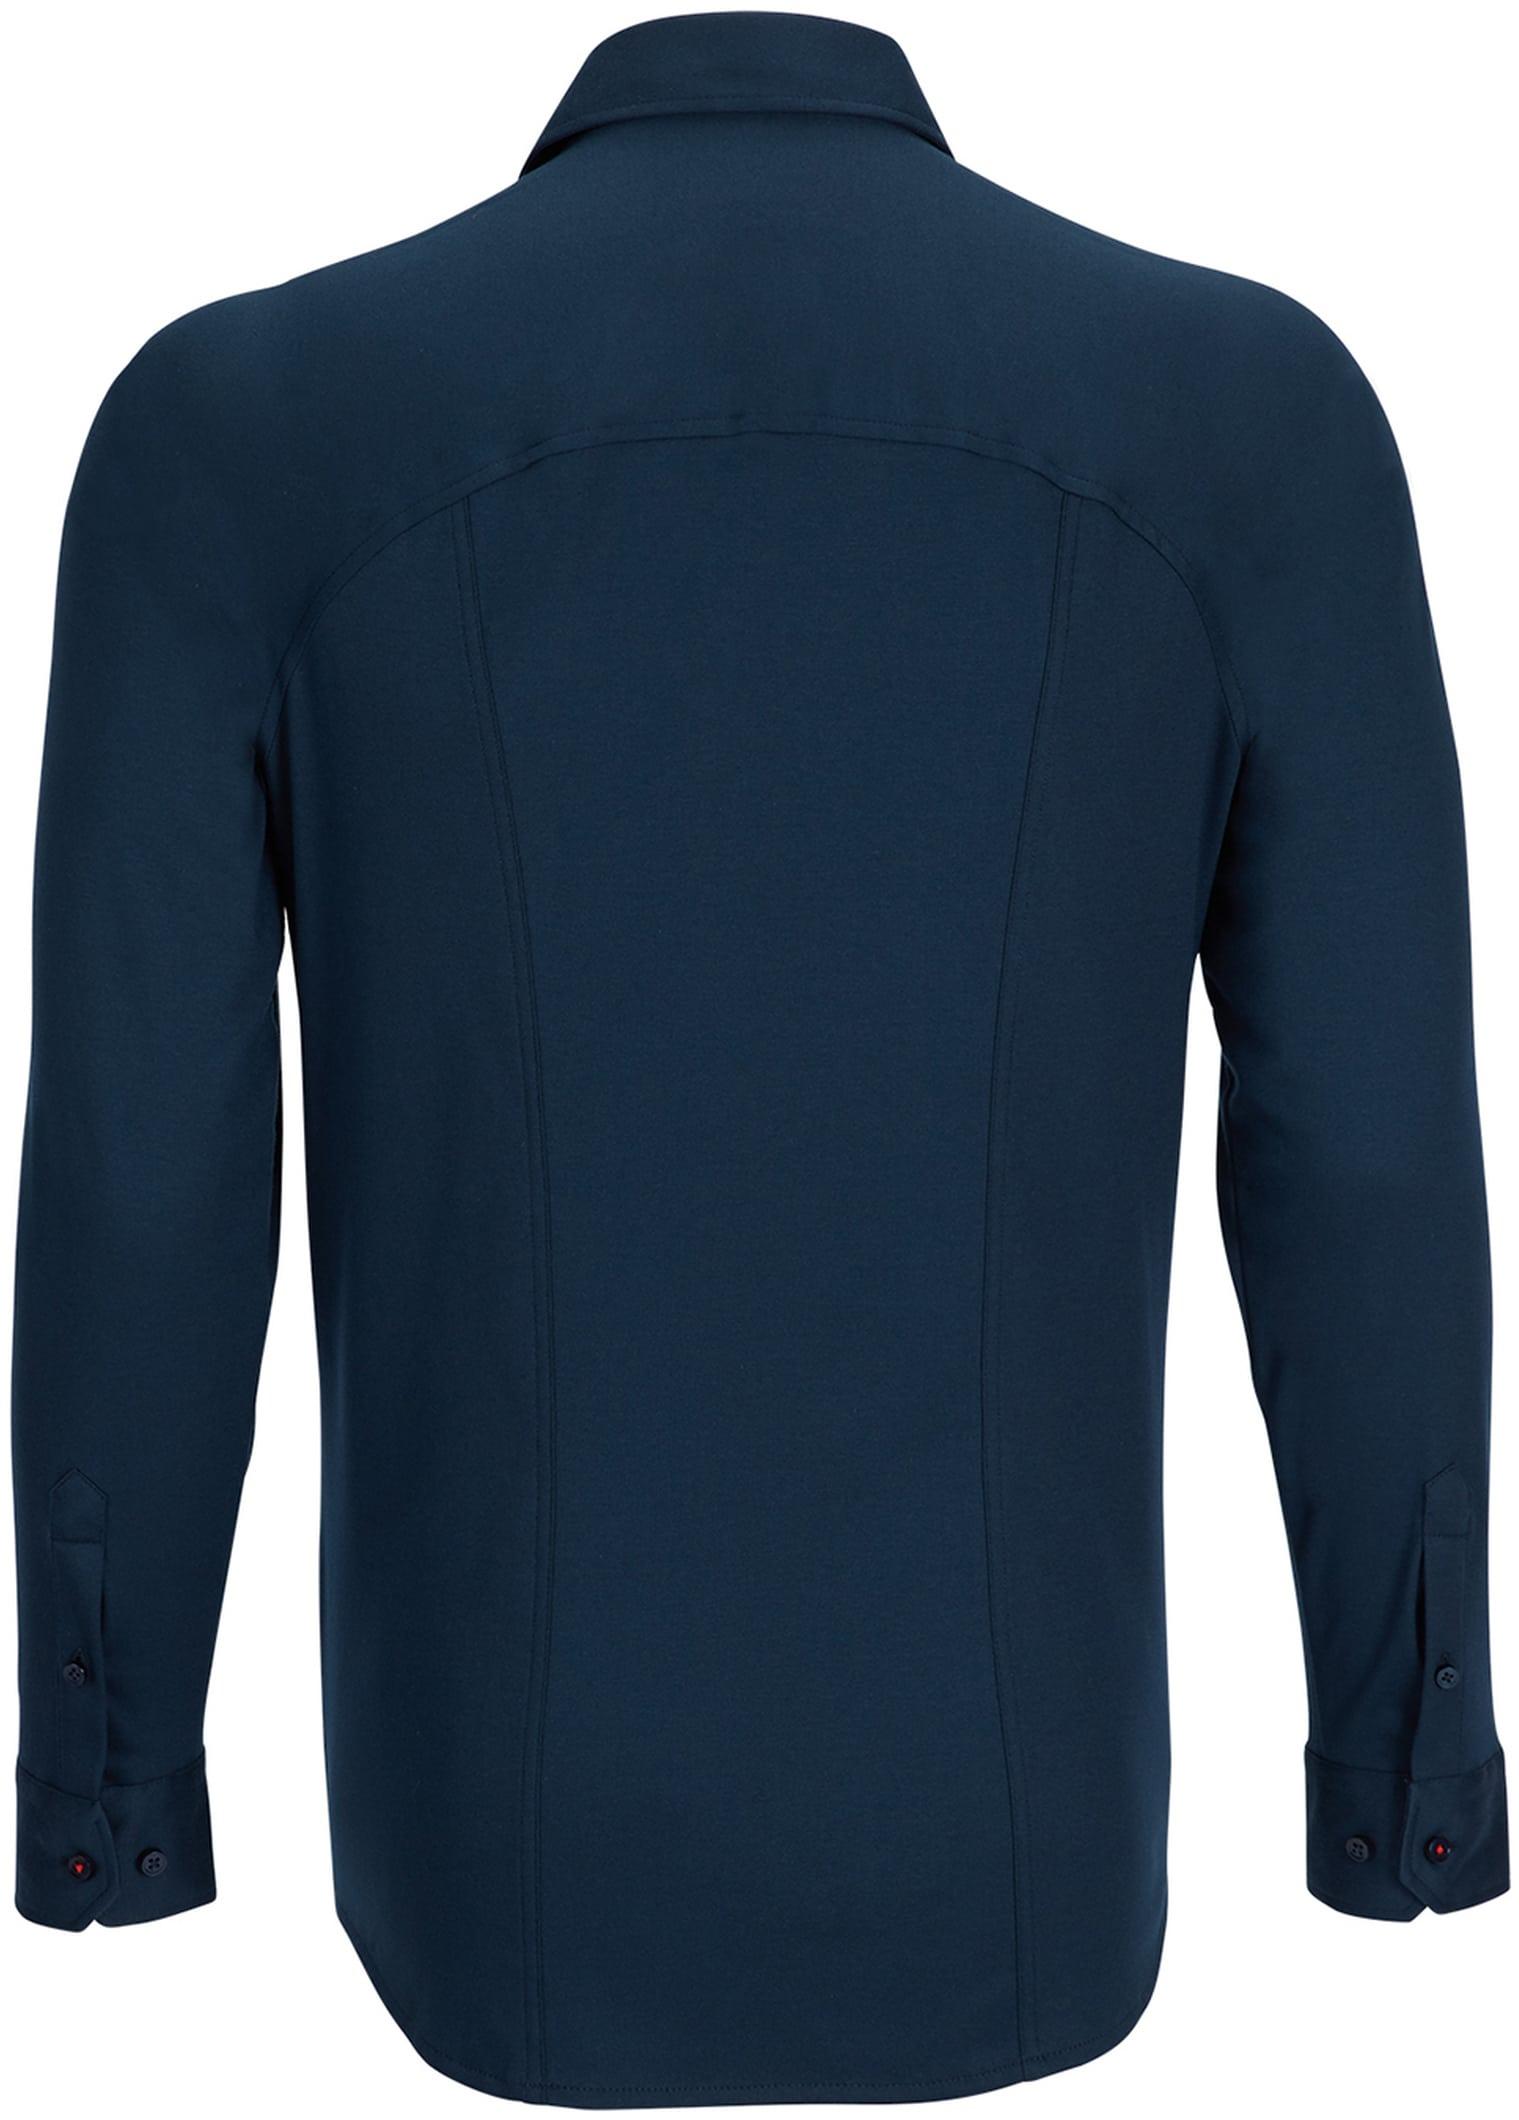 Desoto Overhemd Strijkvrij Donkerblauw foto 1